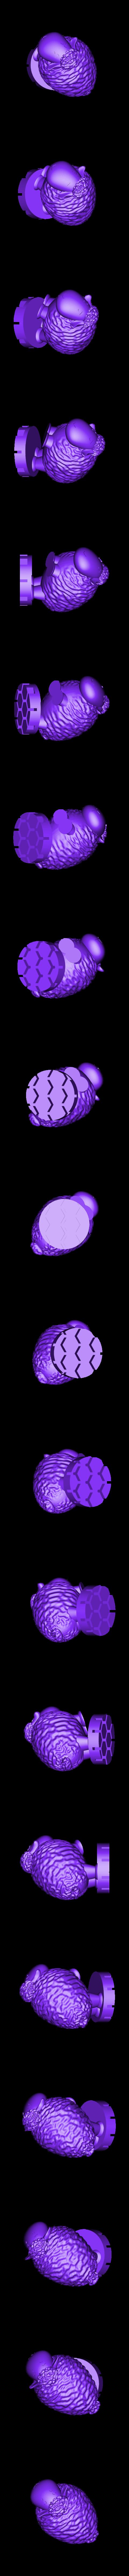 Zoetrope_Prusament Spool_by Dominik Cisar_Sheep 11.stl Download free STL file SPIROGRAPH - PRUSAMENT SPOOL - reuse idea • 3D print model, cisardom